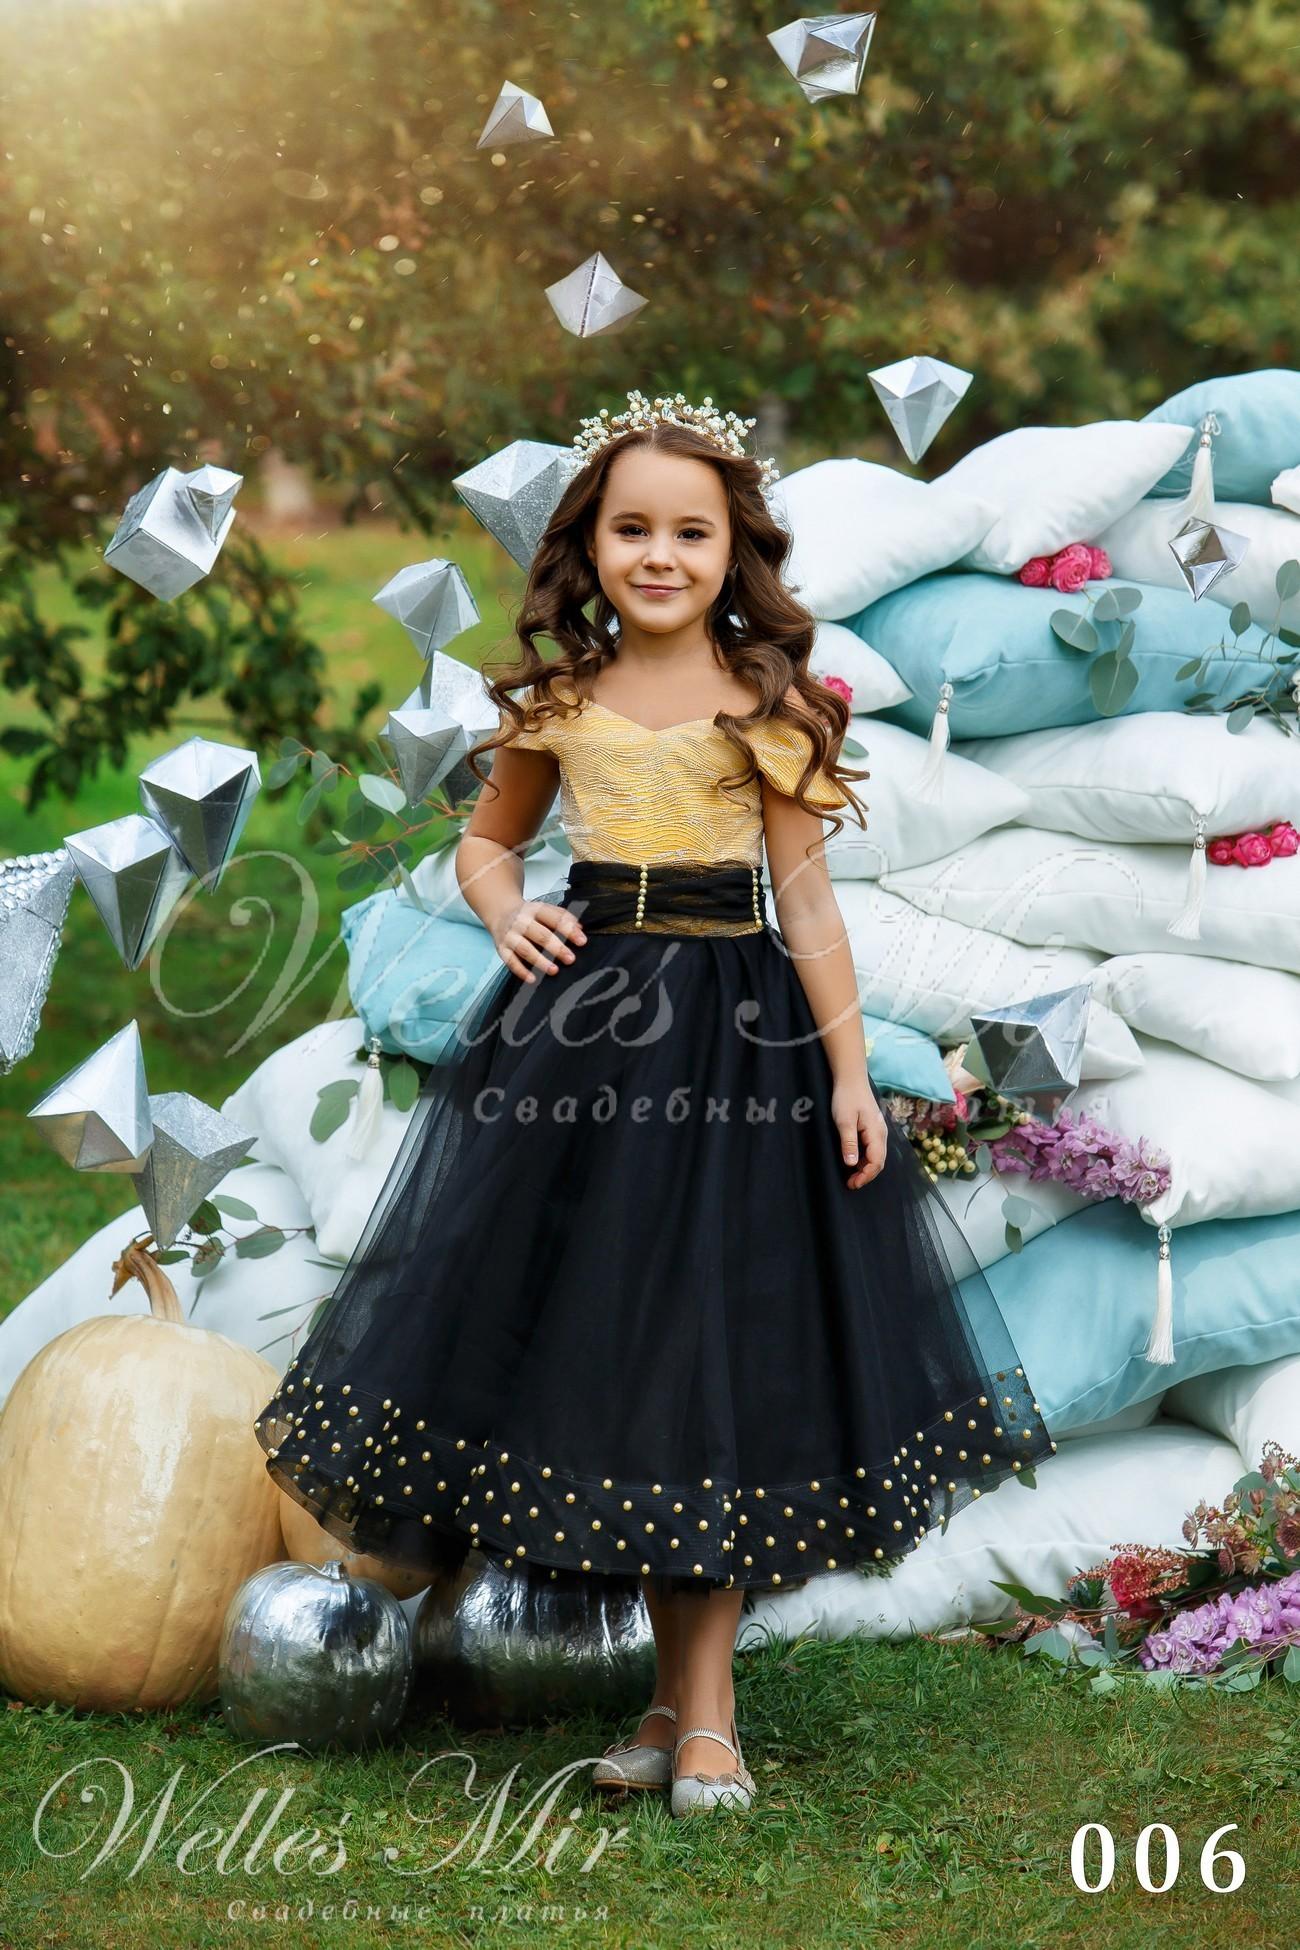 Детские платья Kids Deluxe Collection 2018 - 006